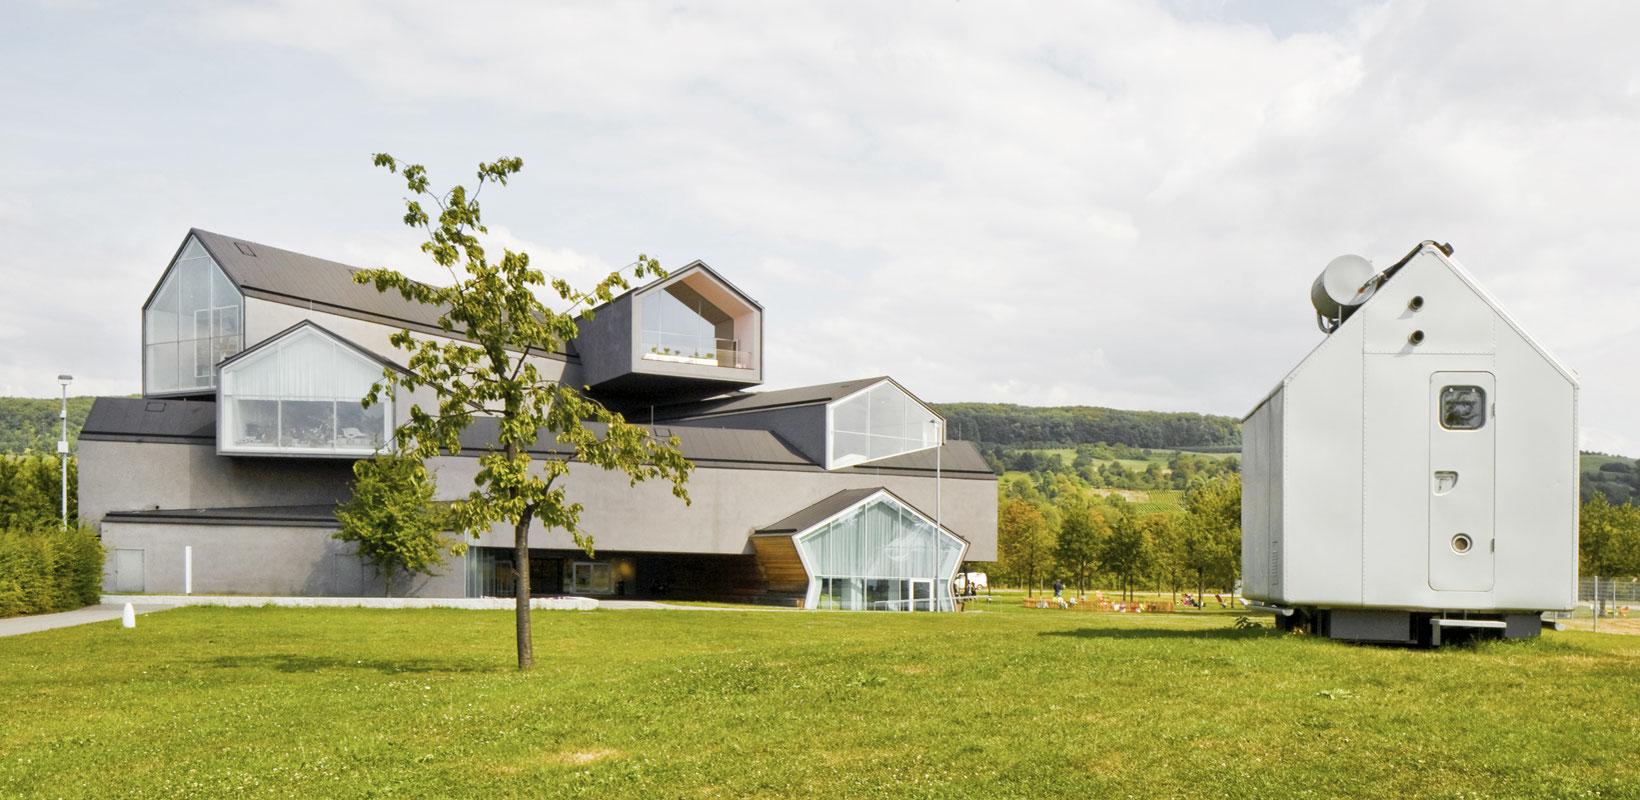 Vitra Haus, Herzog & de Meuron, 2010,   Diogene, Renzo Piano, 2013